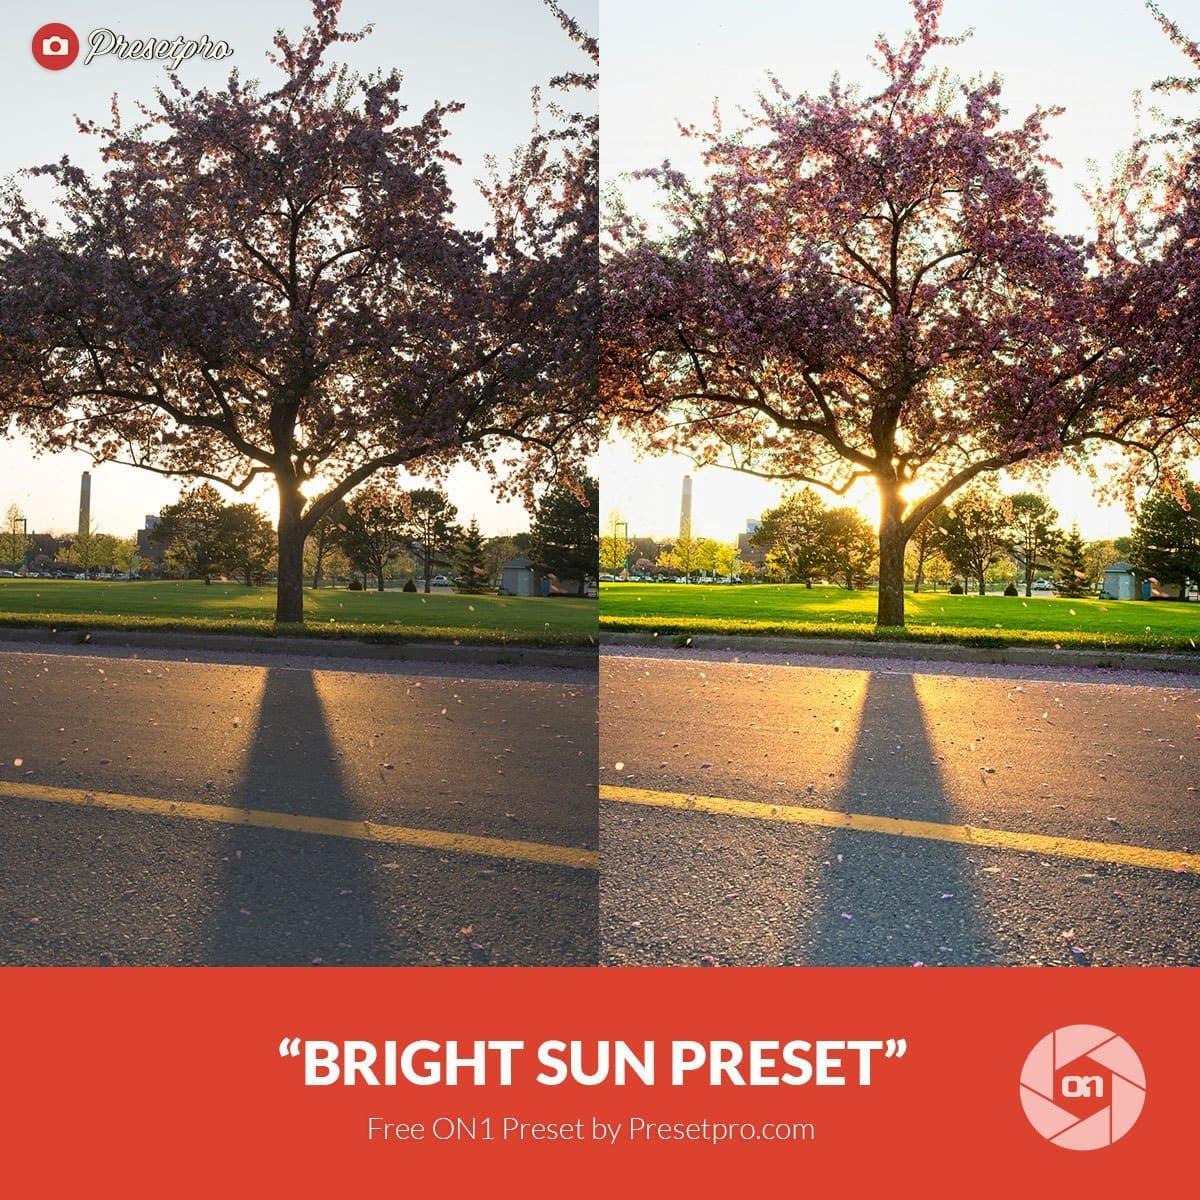 Free-On1-Preset-Bright-Sun-Presetpro.com